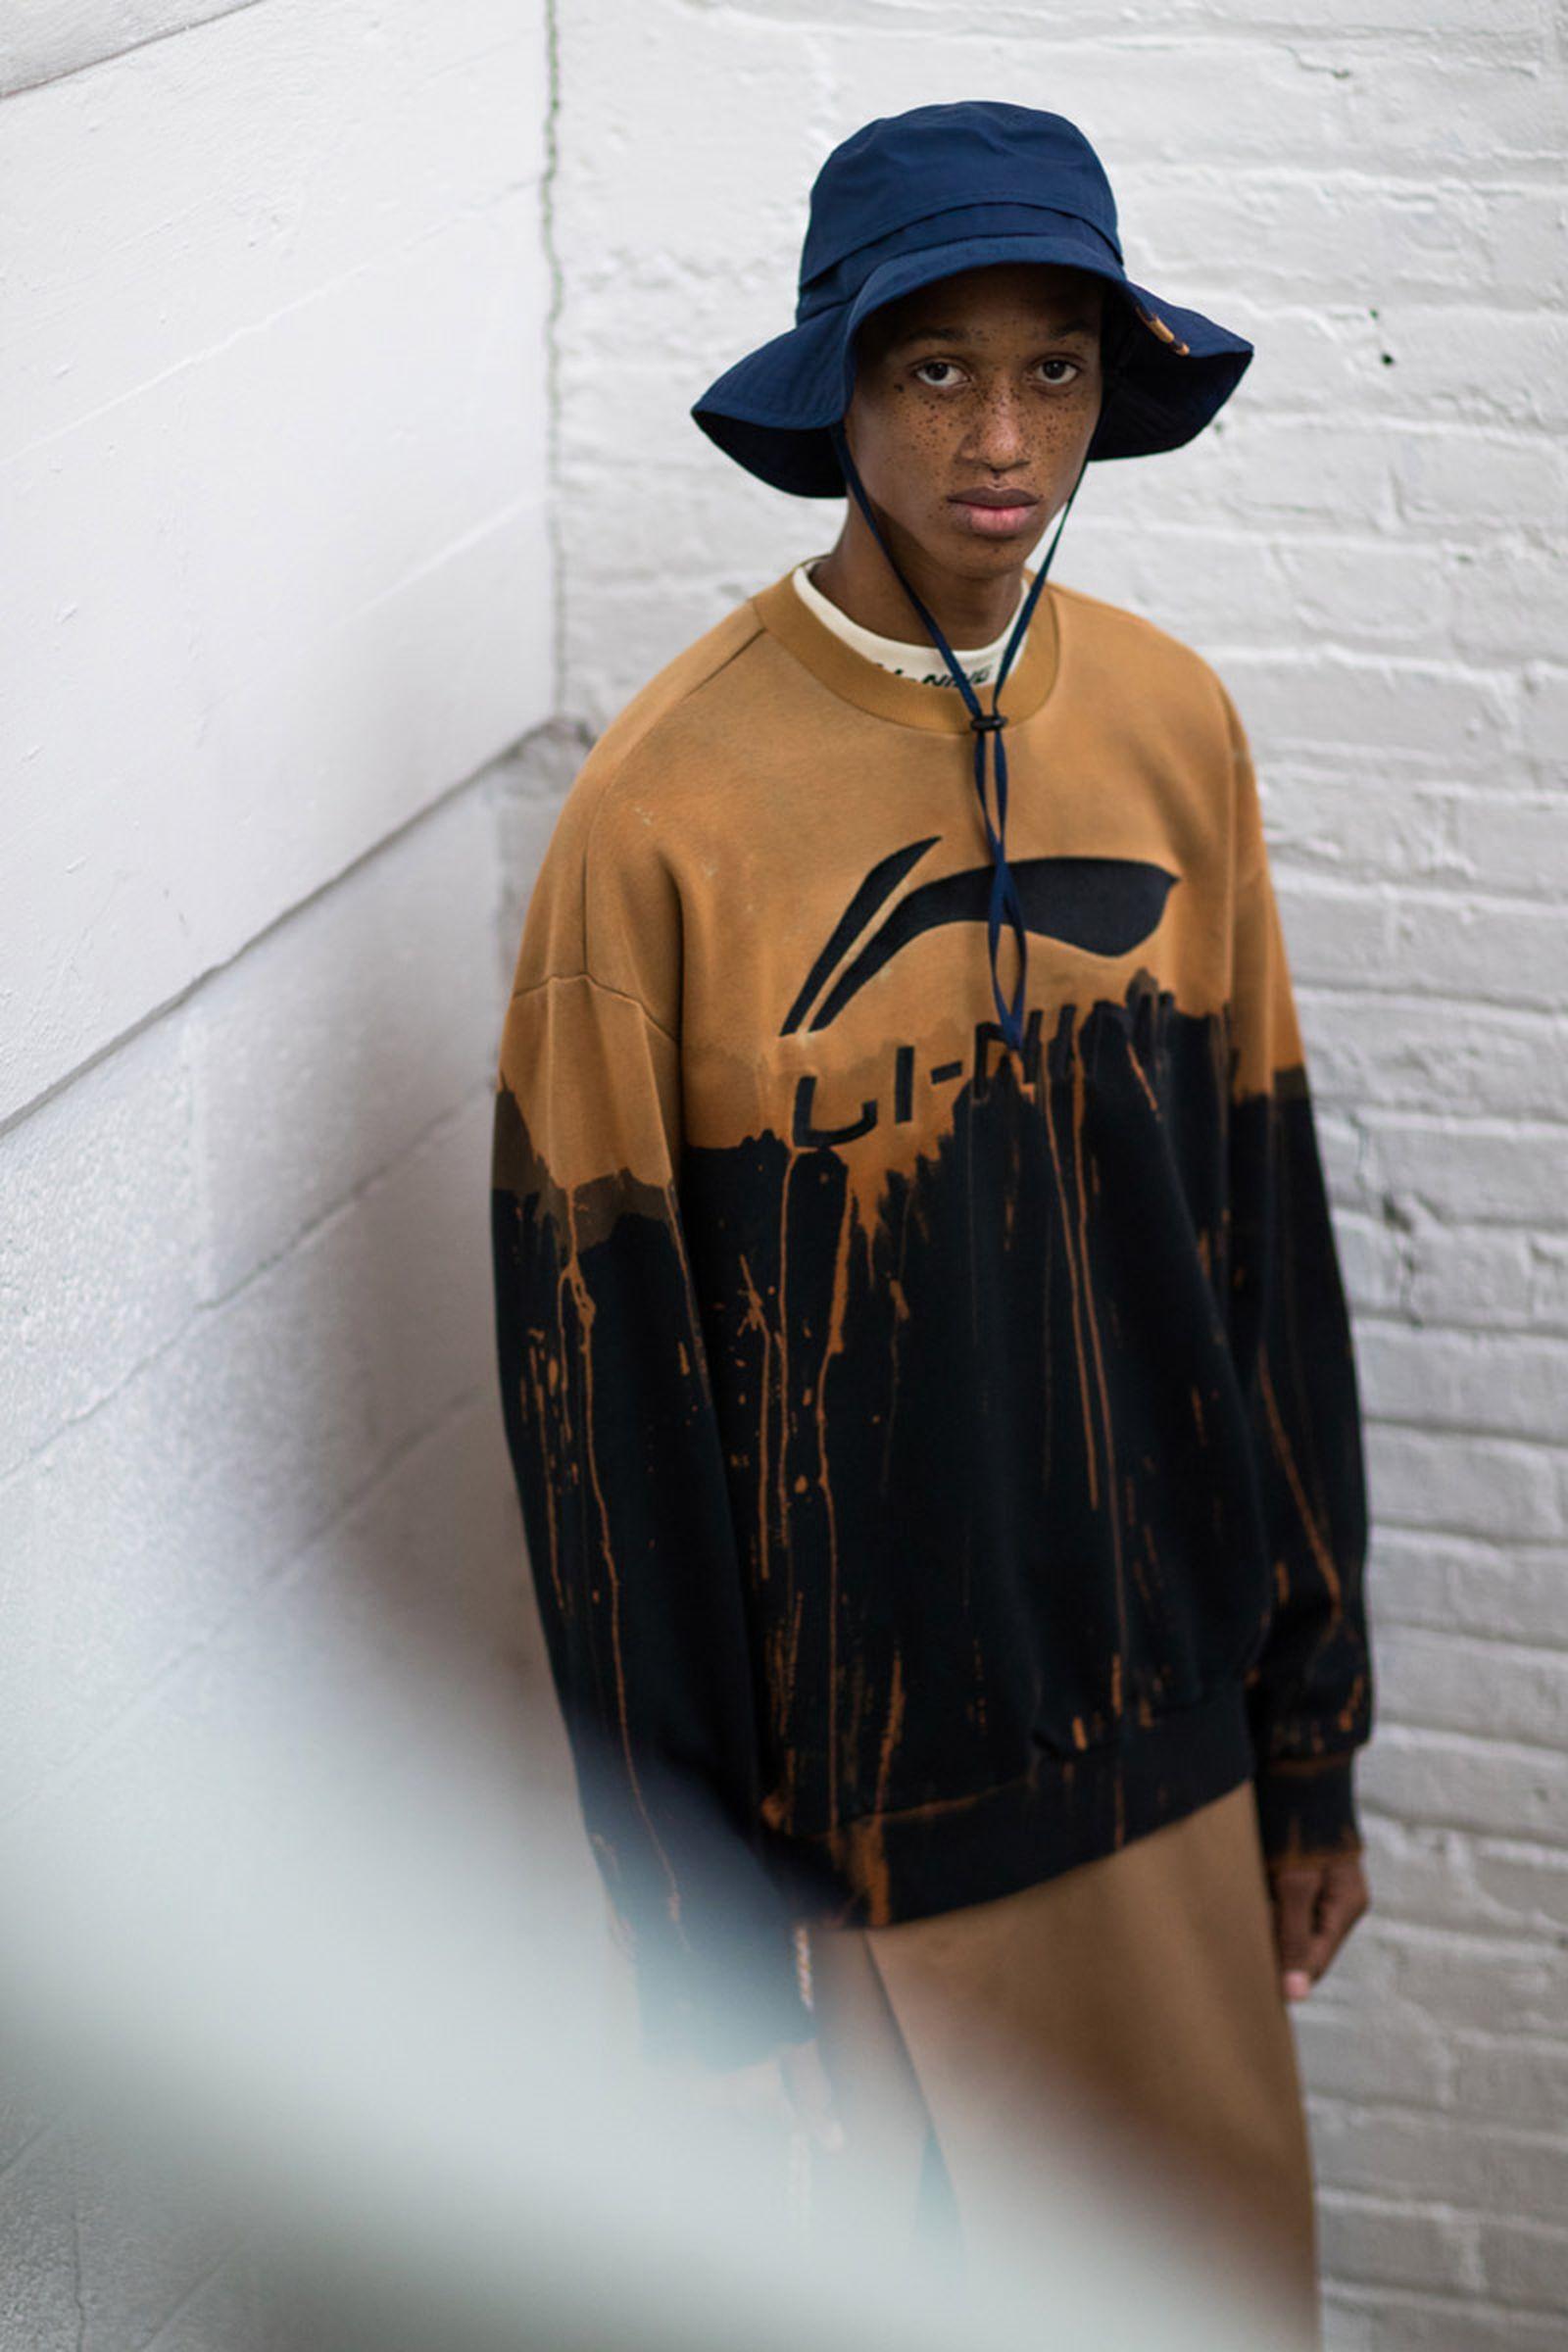 18li ning fw19 new york fashion week fall winter 2019 fashion shows nyfw